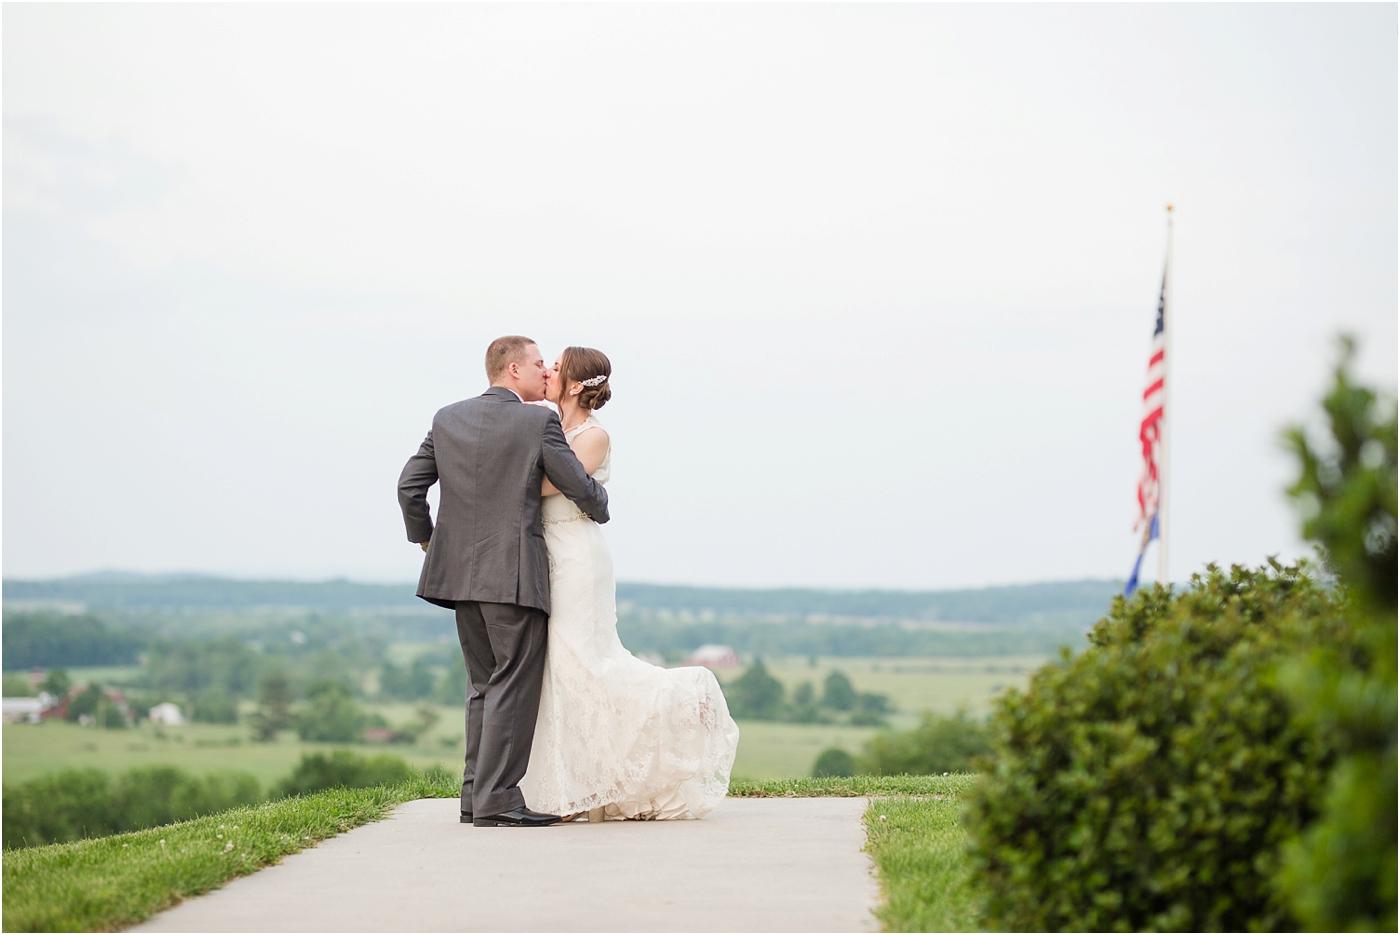 Gettysburg-lodges-wedding-photos-94.jpg